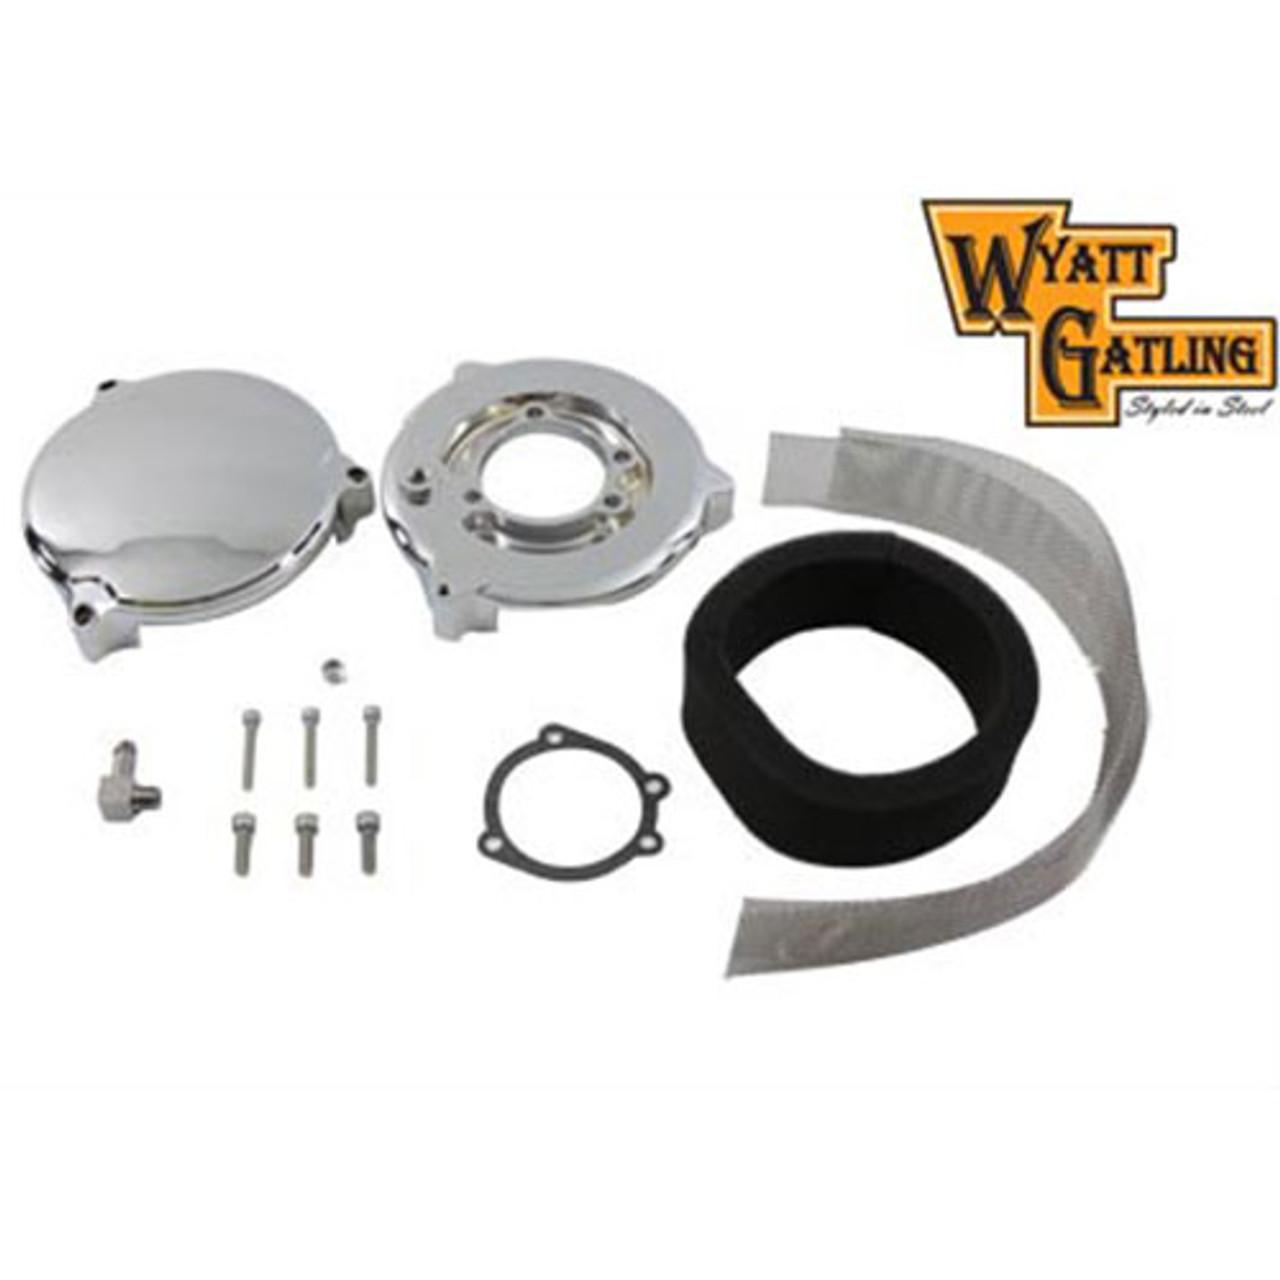 V-Twin Mfg  Chrome Round Smooth Air Cleaner for CV Carbs